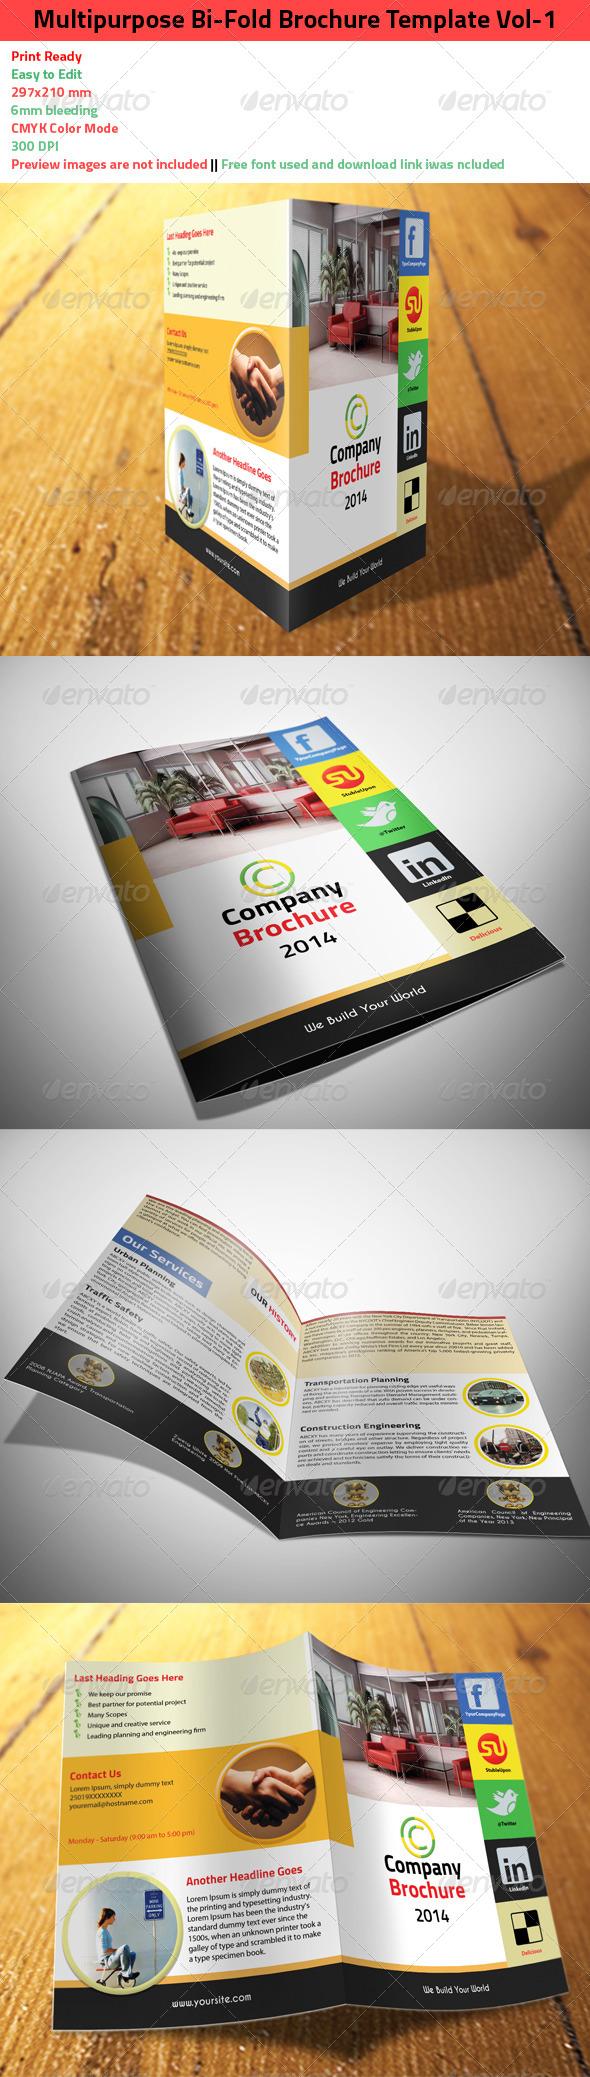 GraphicRiver Multipurpose Bi-Fold Brochure Template Vol-1 6488501